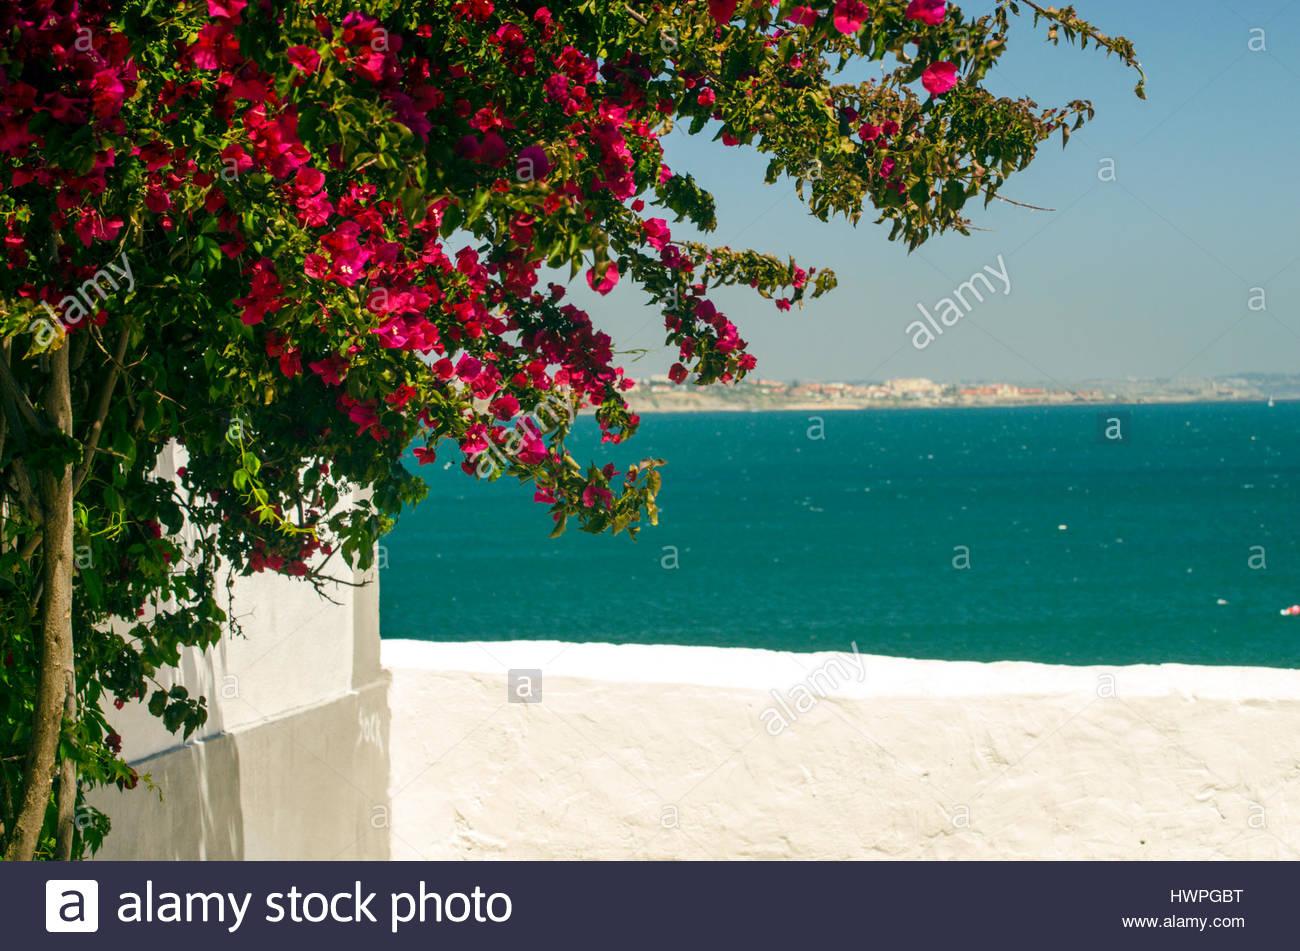 Bougainvillea by the sea in Portugal. - Stock Image